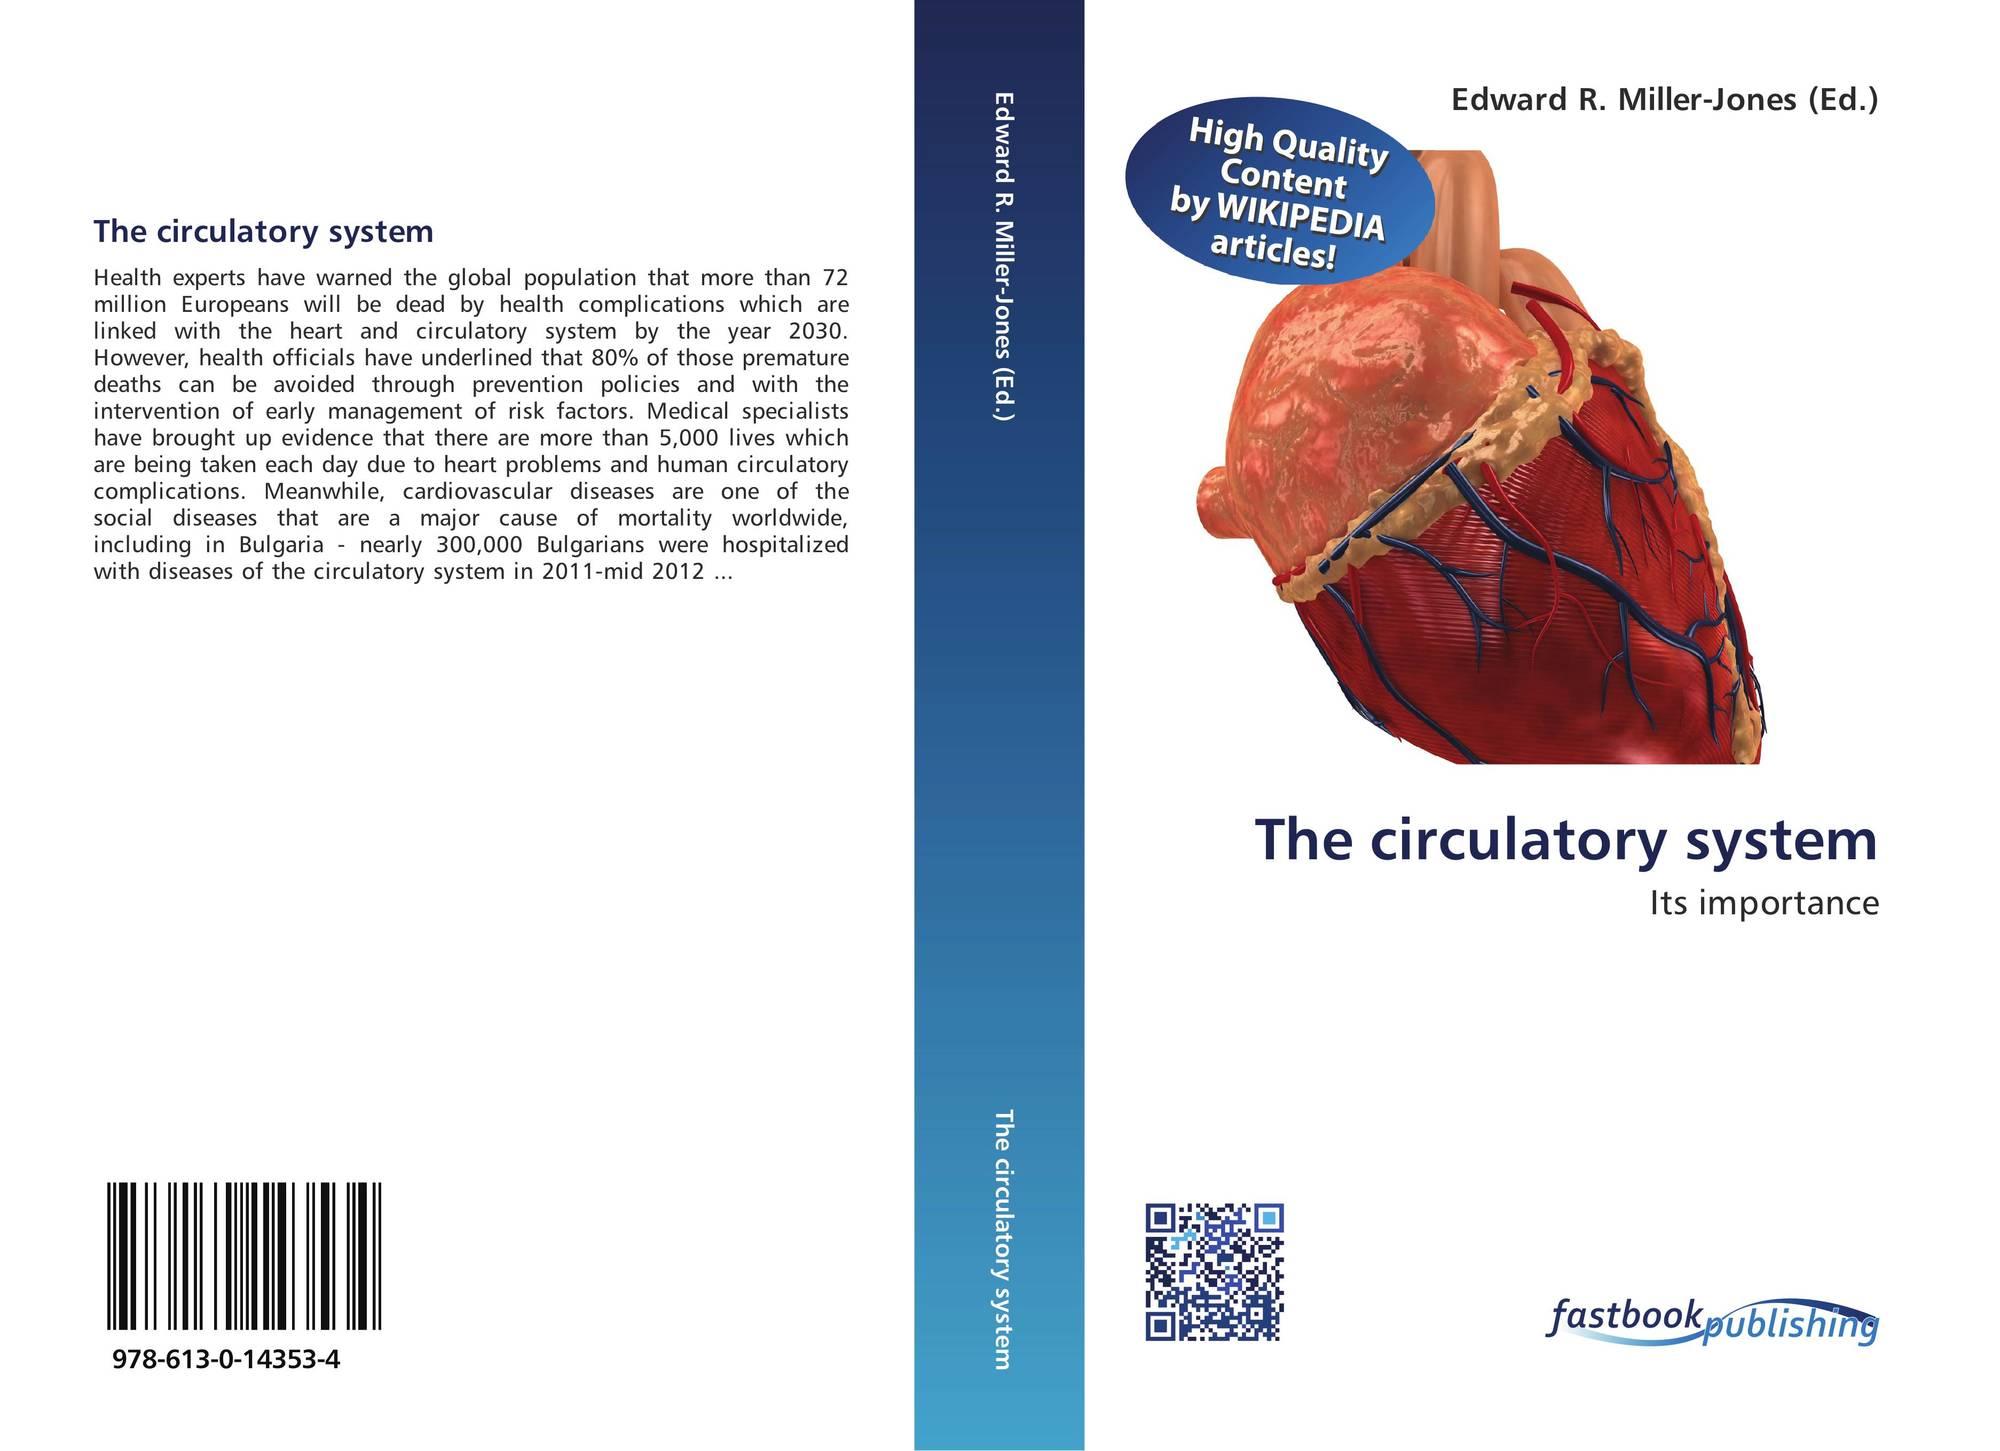 The circulatory system, 40400 40400 400 400 40, 404004004002 ,404004040040040040